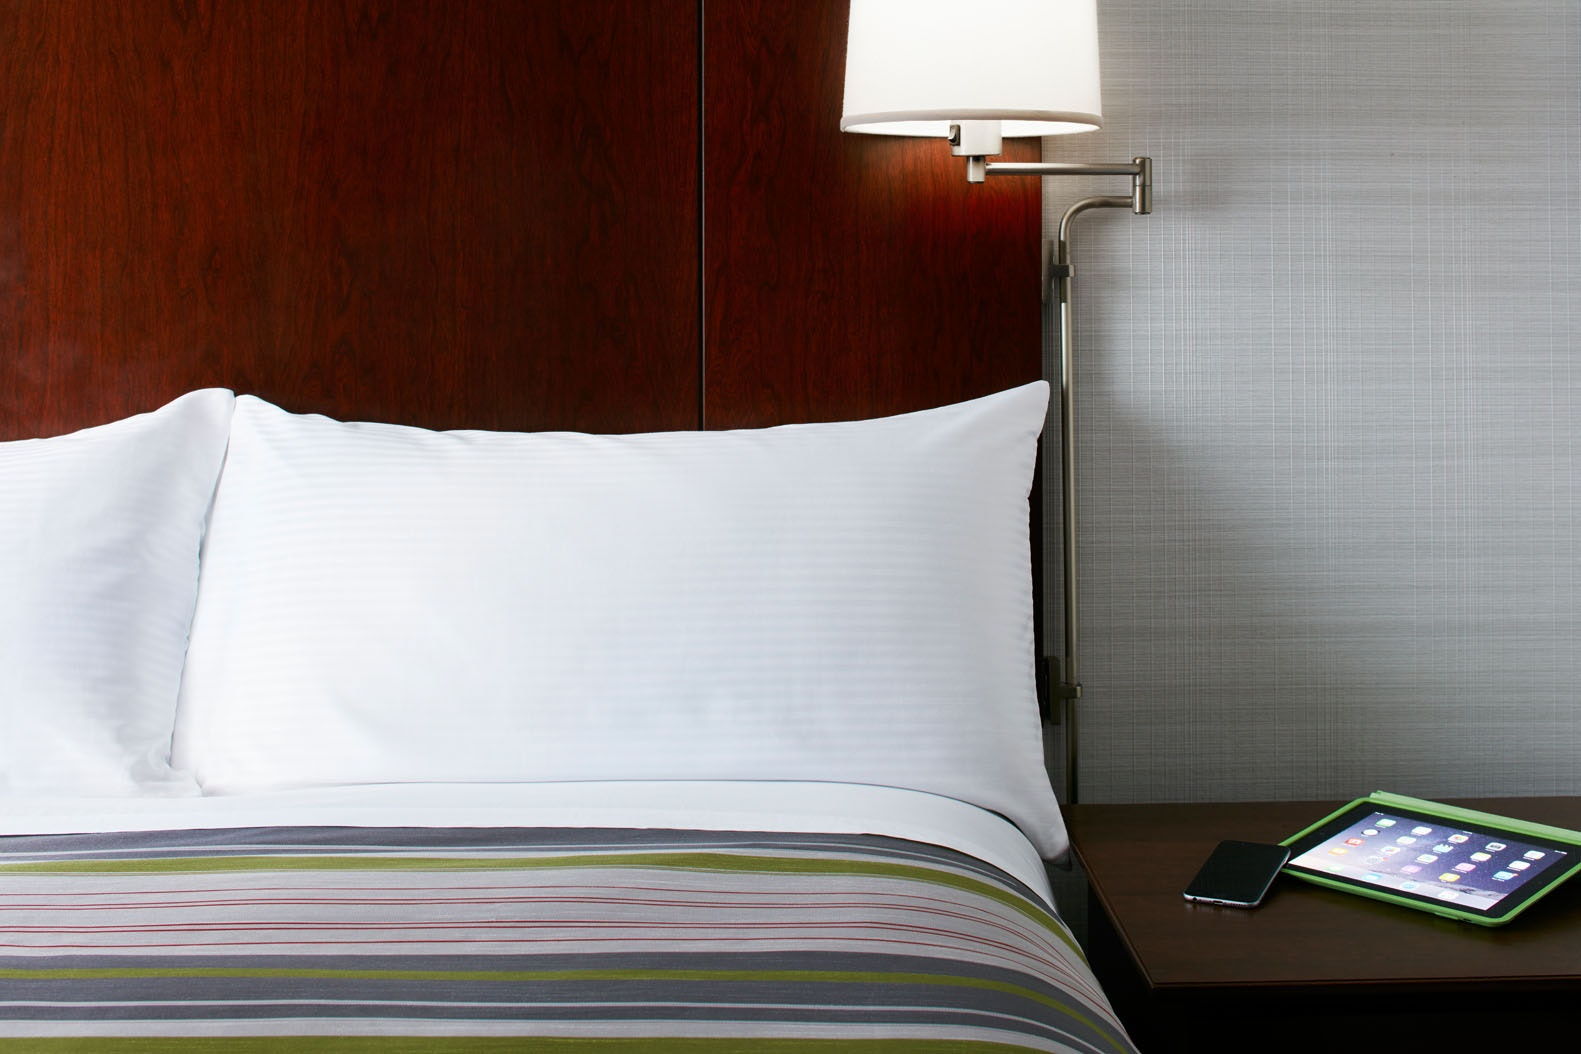 One Room Suite Club Quarters Hotel in